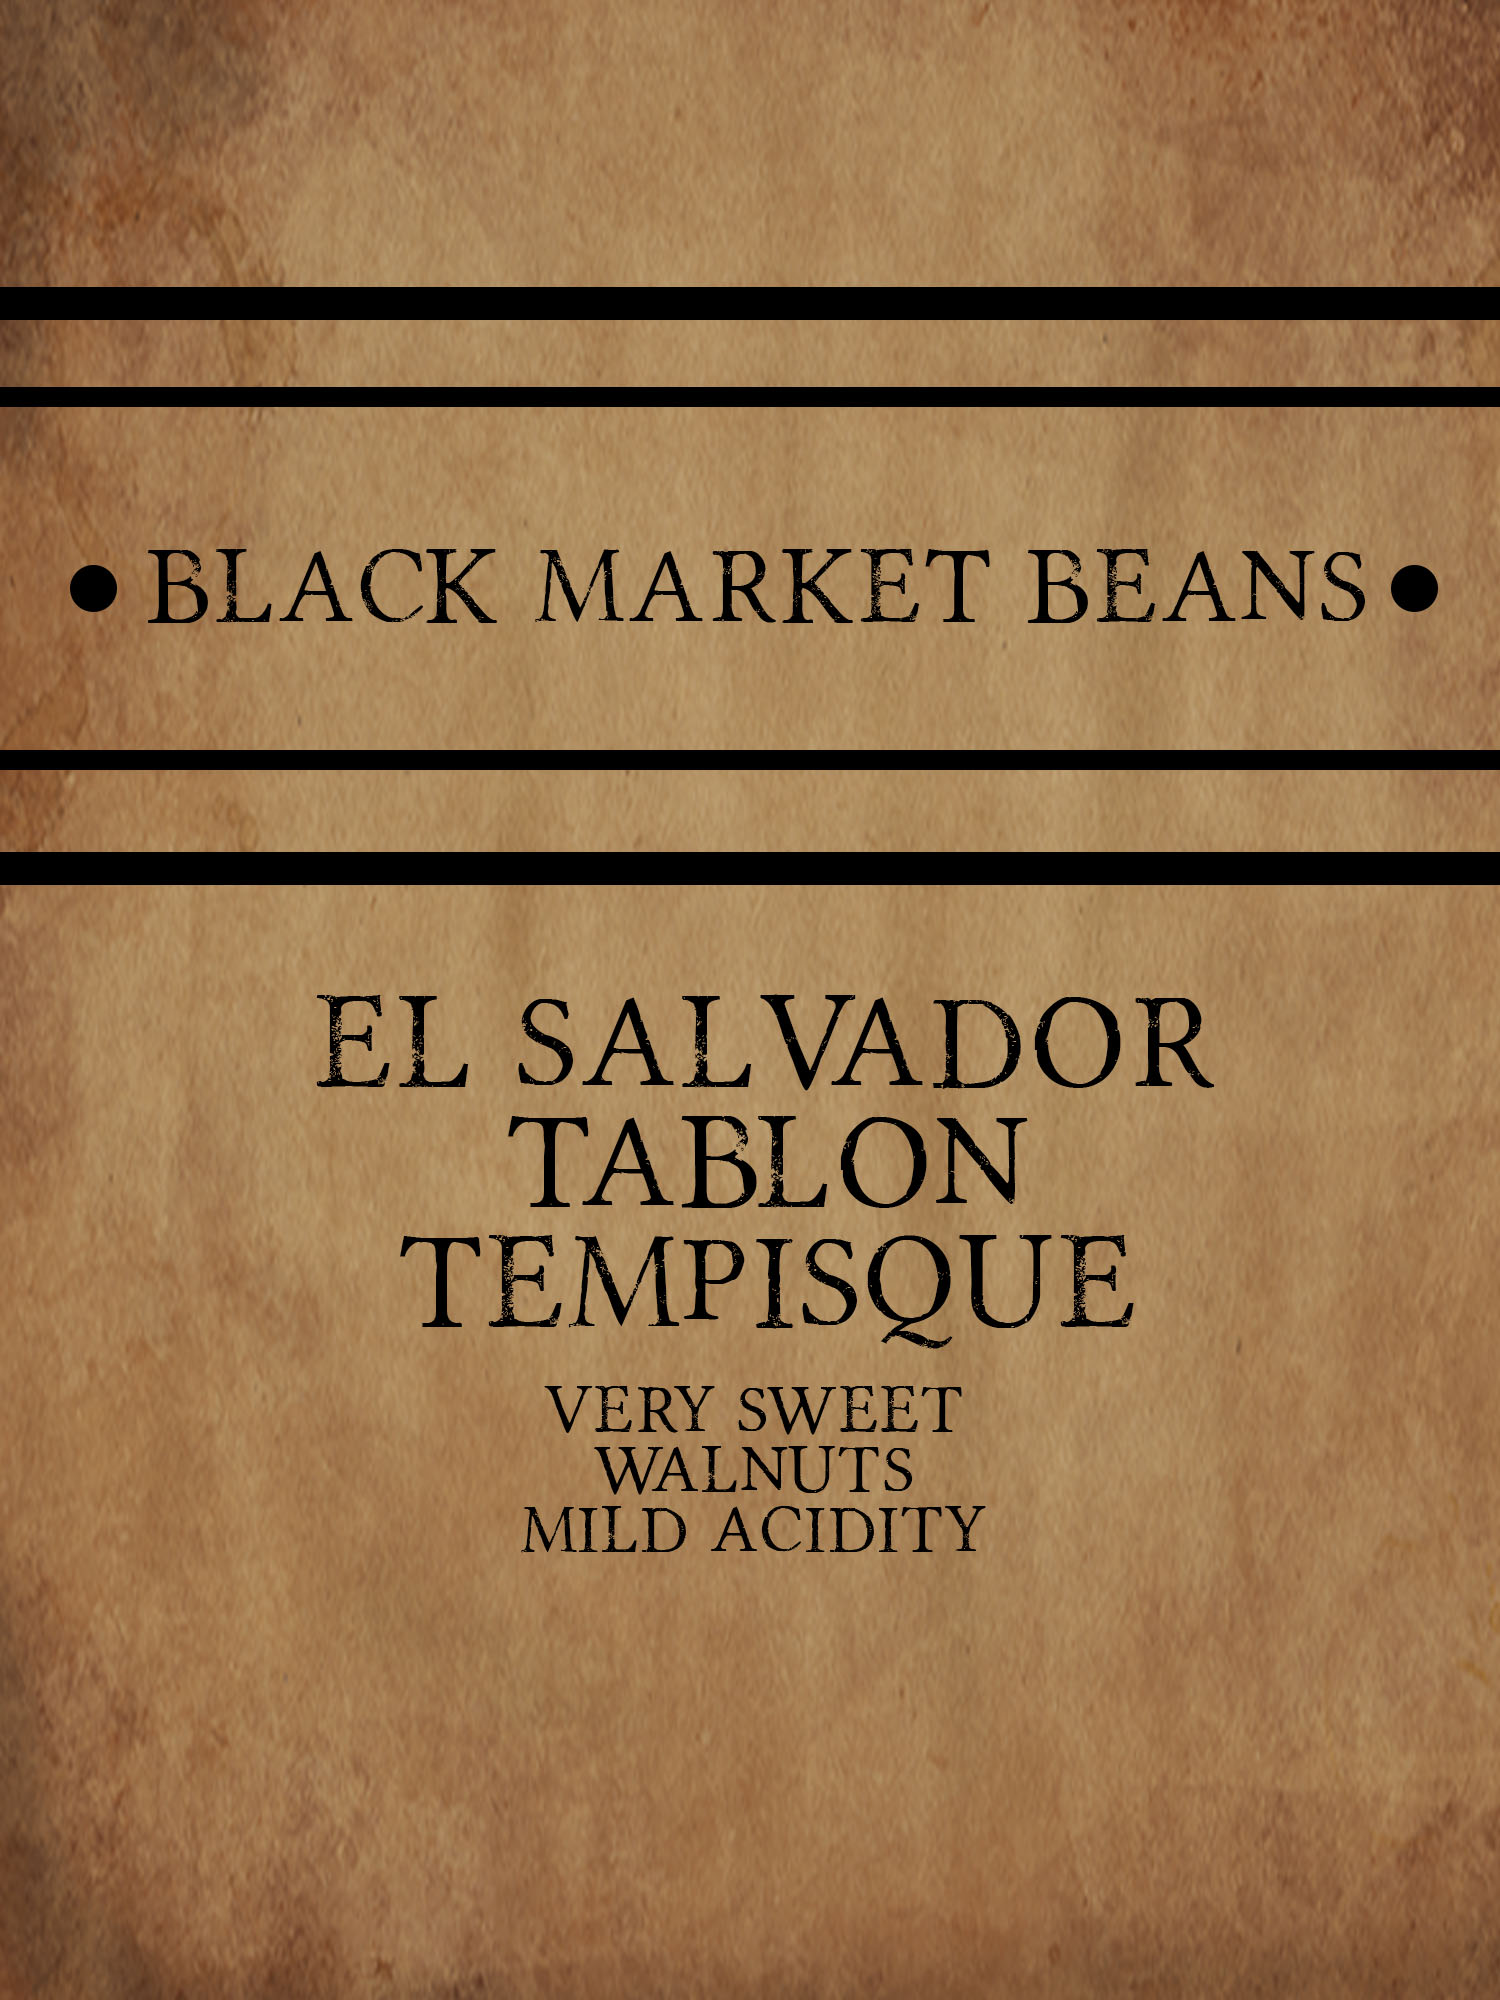 coffee_ElSalvador_Tablon_Tempisque.jpg